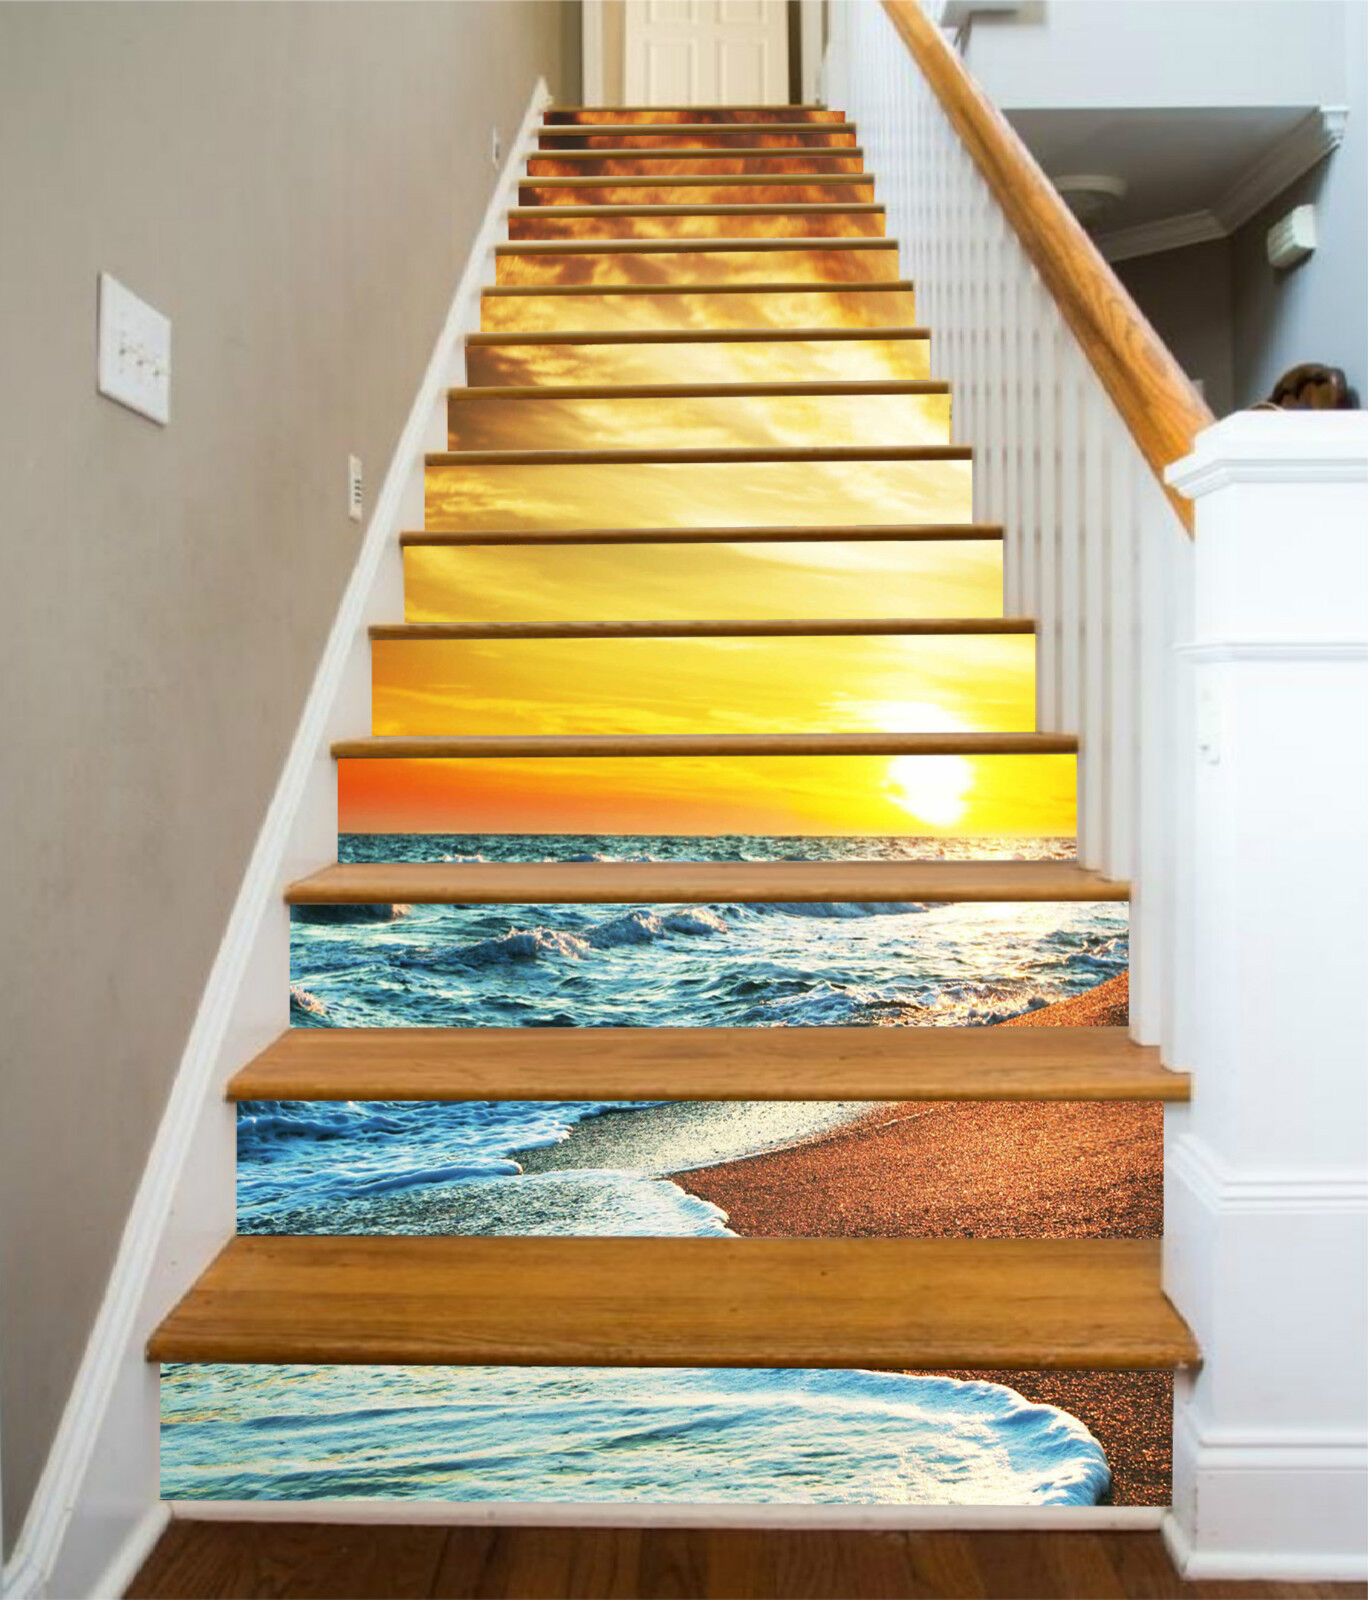 3D Abend Strand 475 Stair Risers Dekoration Fototapete Vinyl Aufkleber Tapete DE